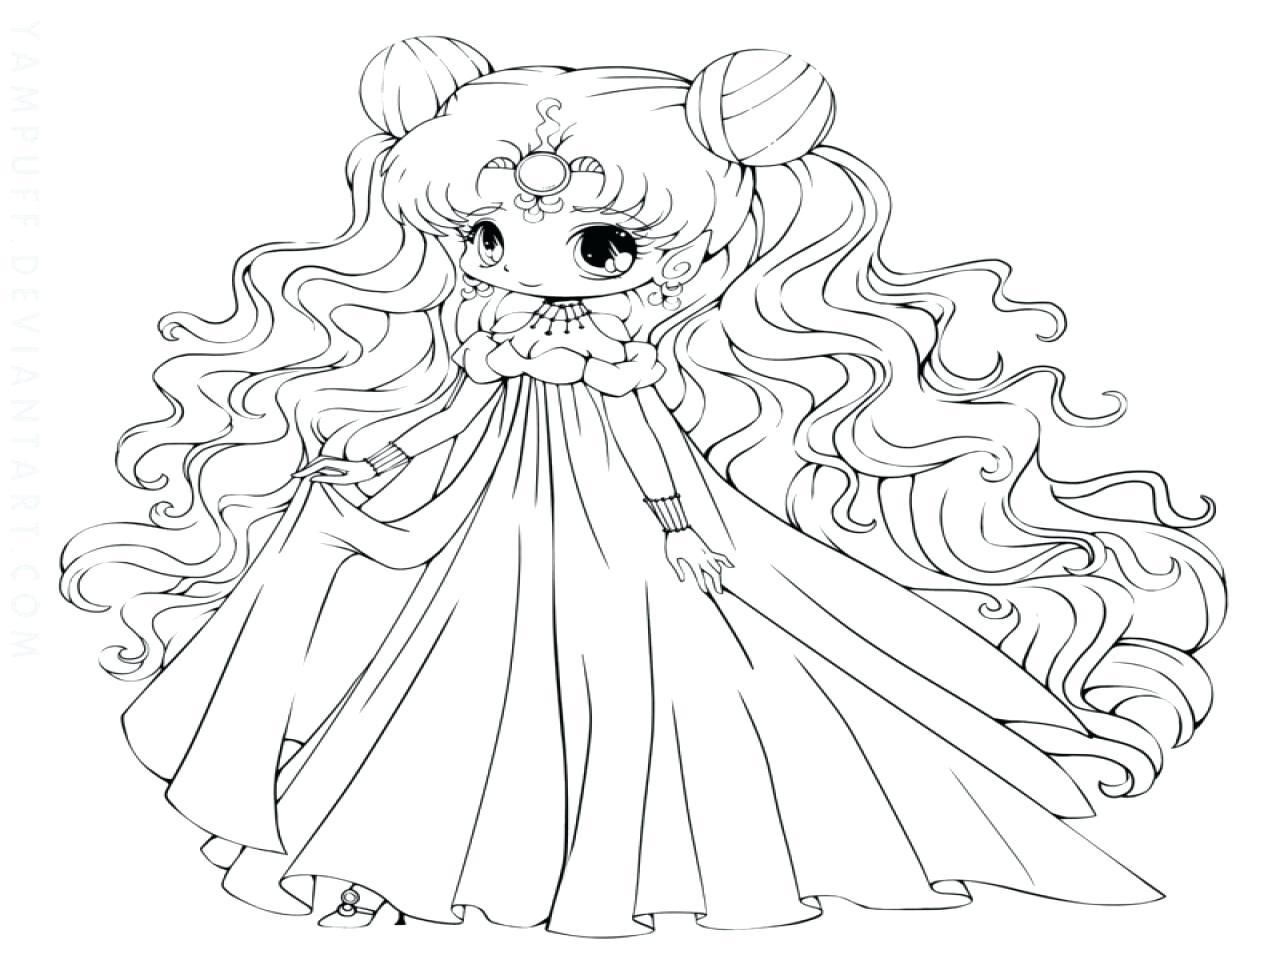 1280x960 Fresh Chibi Princess Coloring Pages Design Printable Coloring Sheet